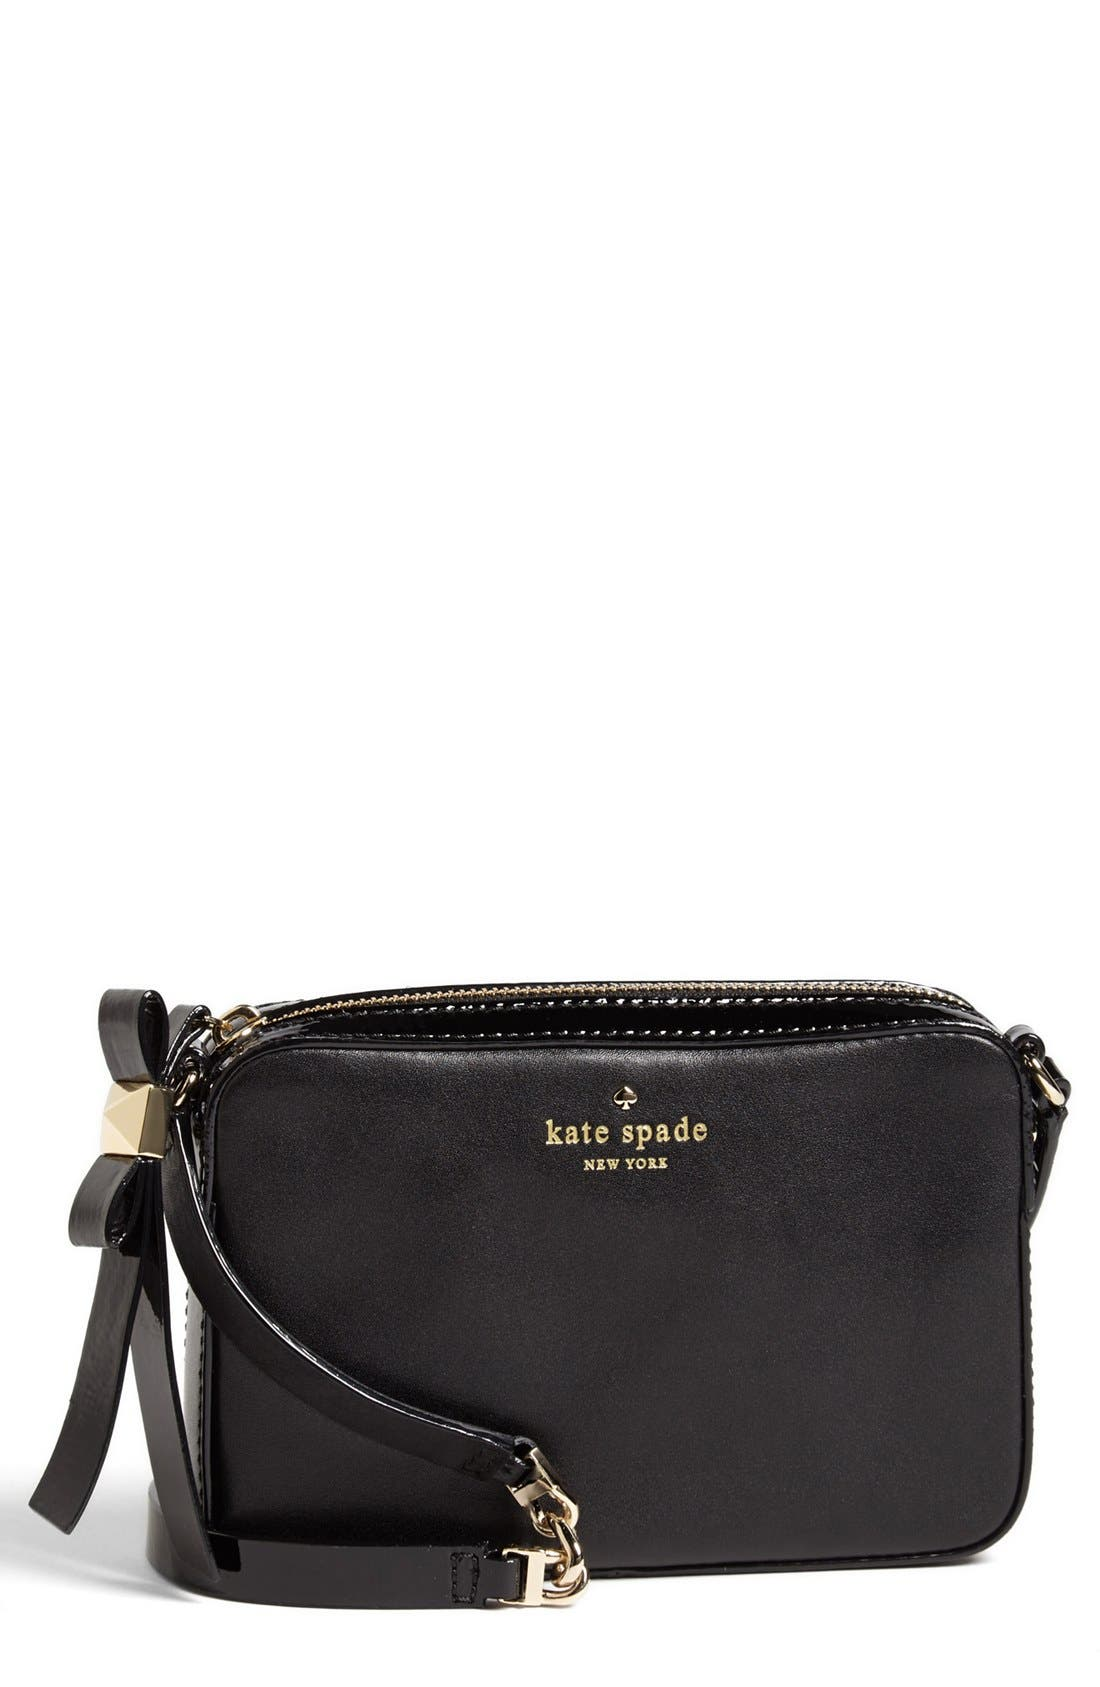 Main Image - kate spade new york 'clover' leather crossbody bag